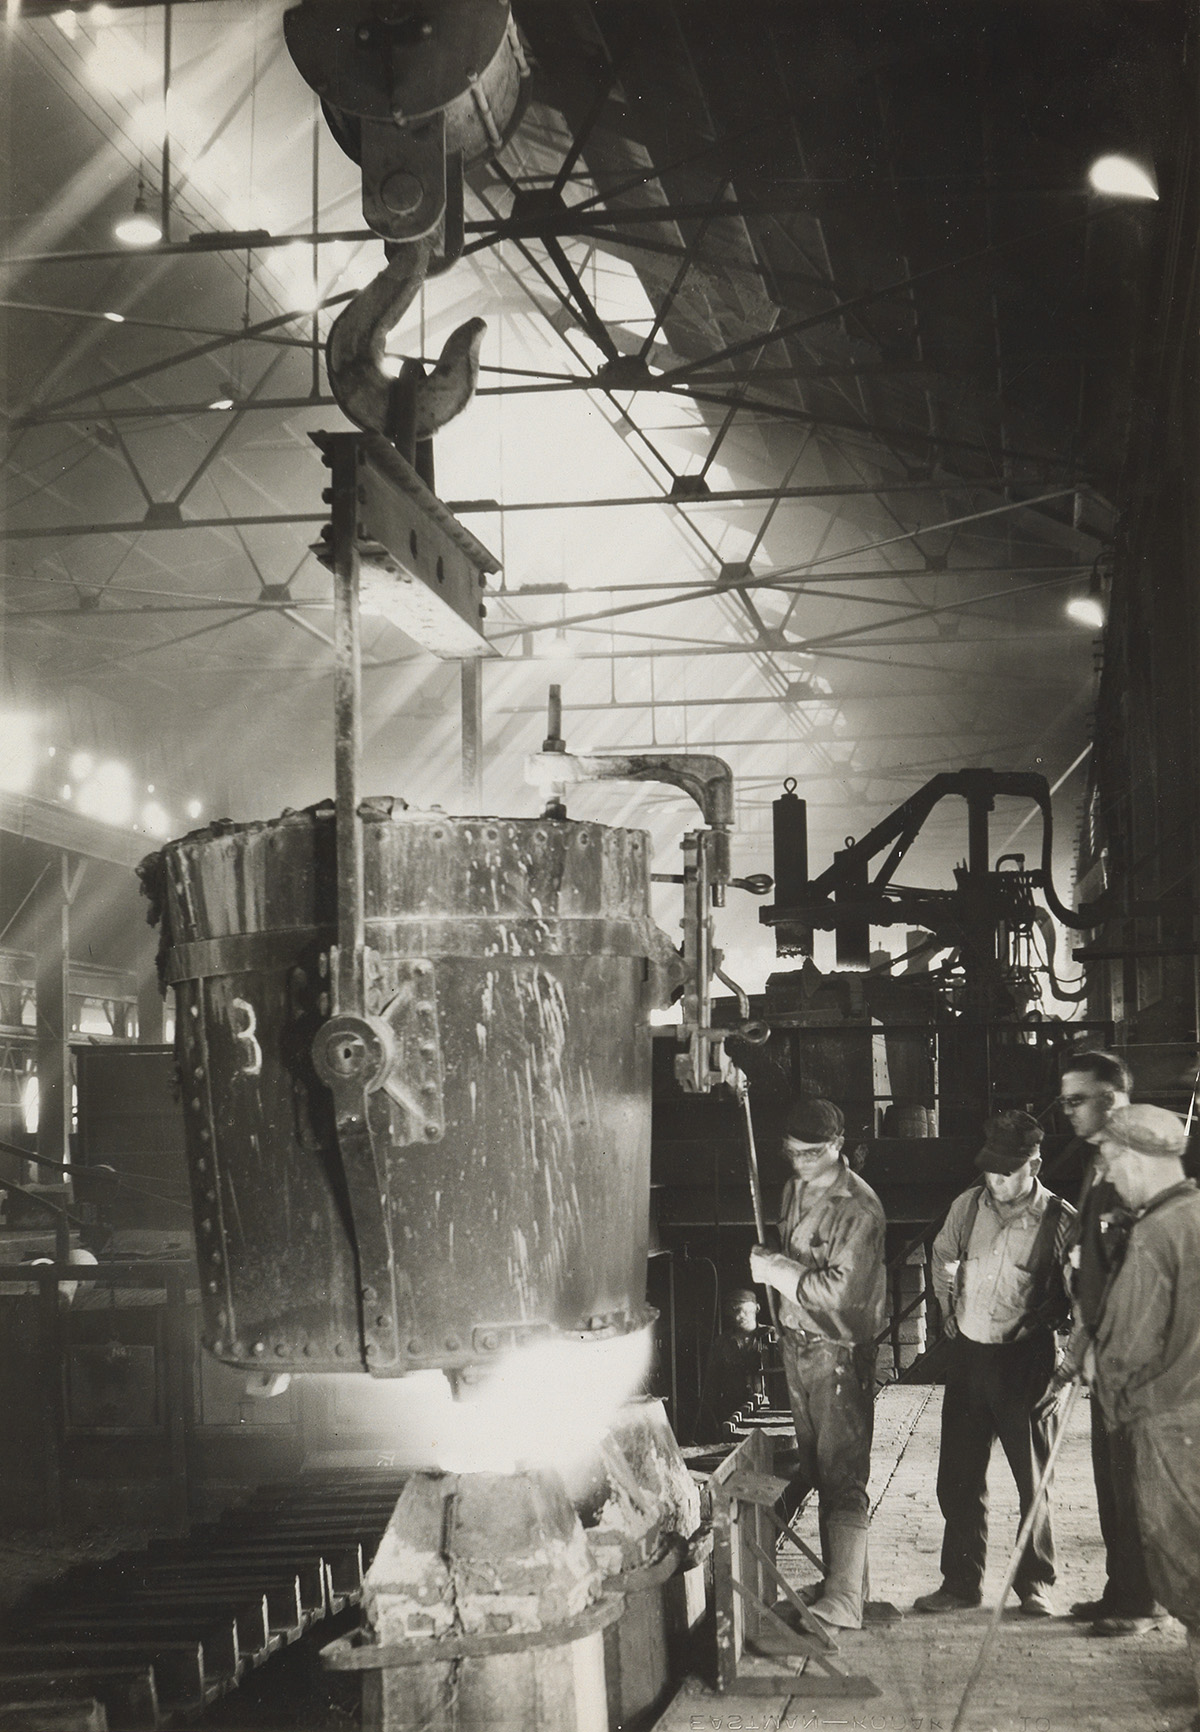 MARGARET BOURKE-WHITE (1904-1971) Pouring Ingots, Ludlum Steel Co.